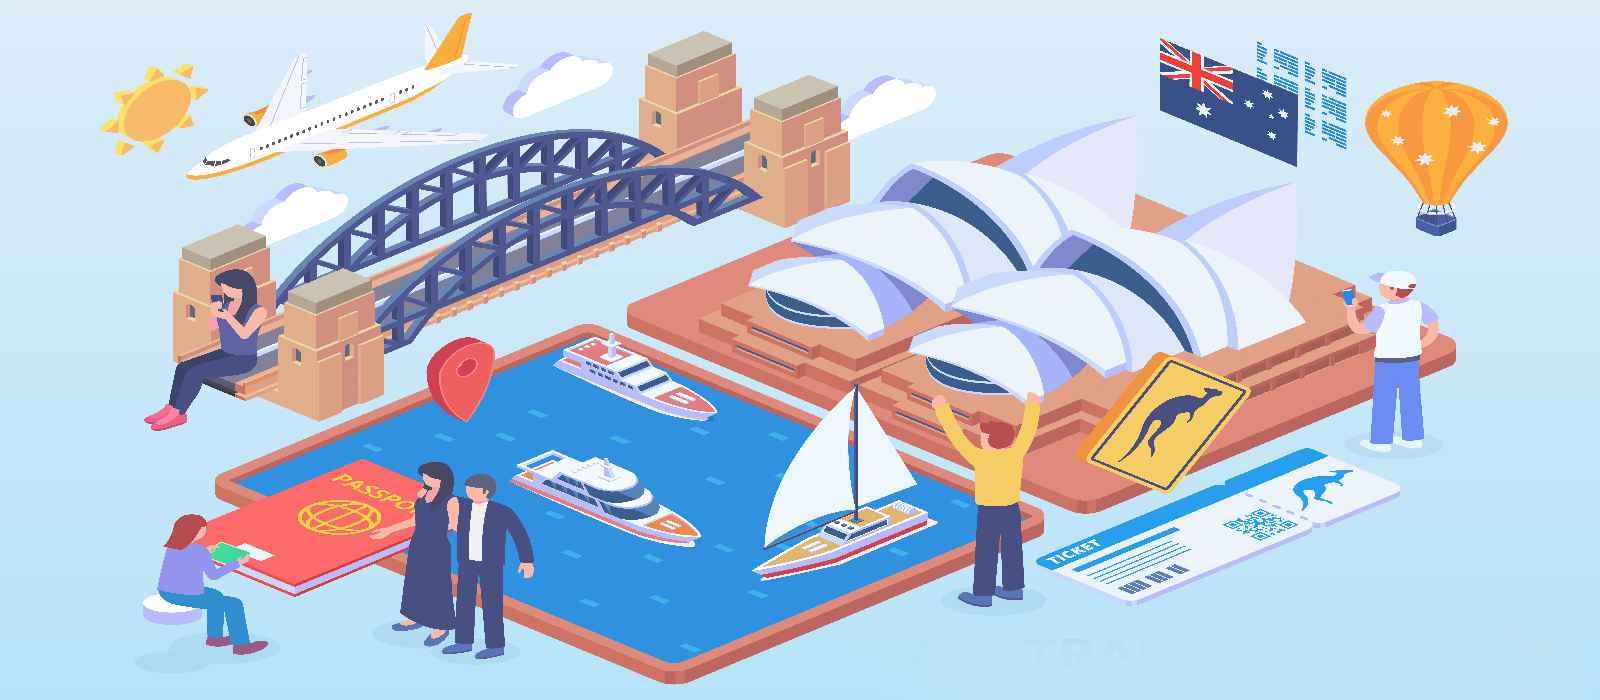 Tips for new international students in Australia